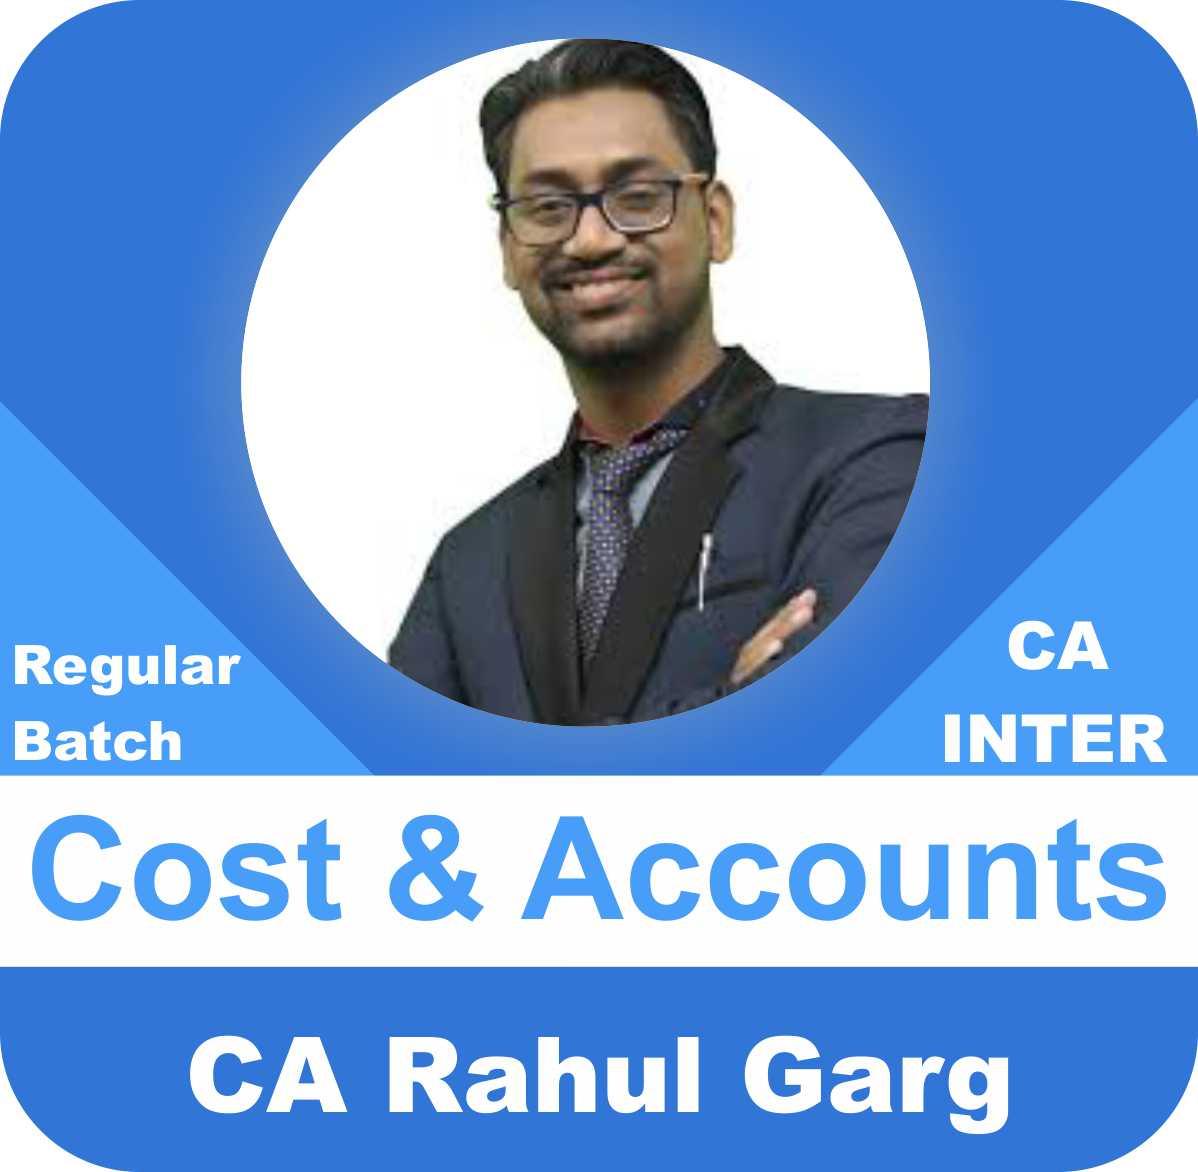 Cost Regular Batch & Accounting Regular Batch Combo